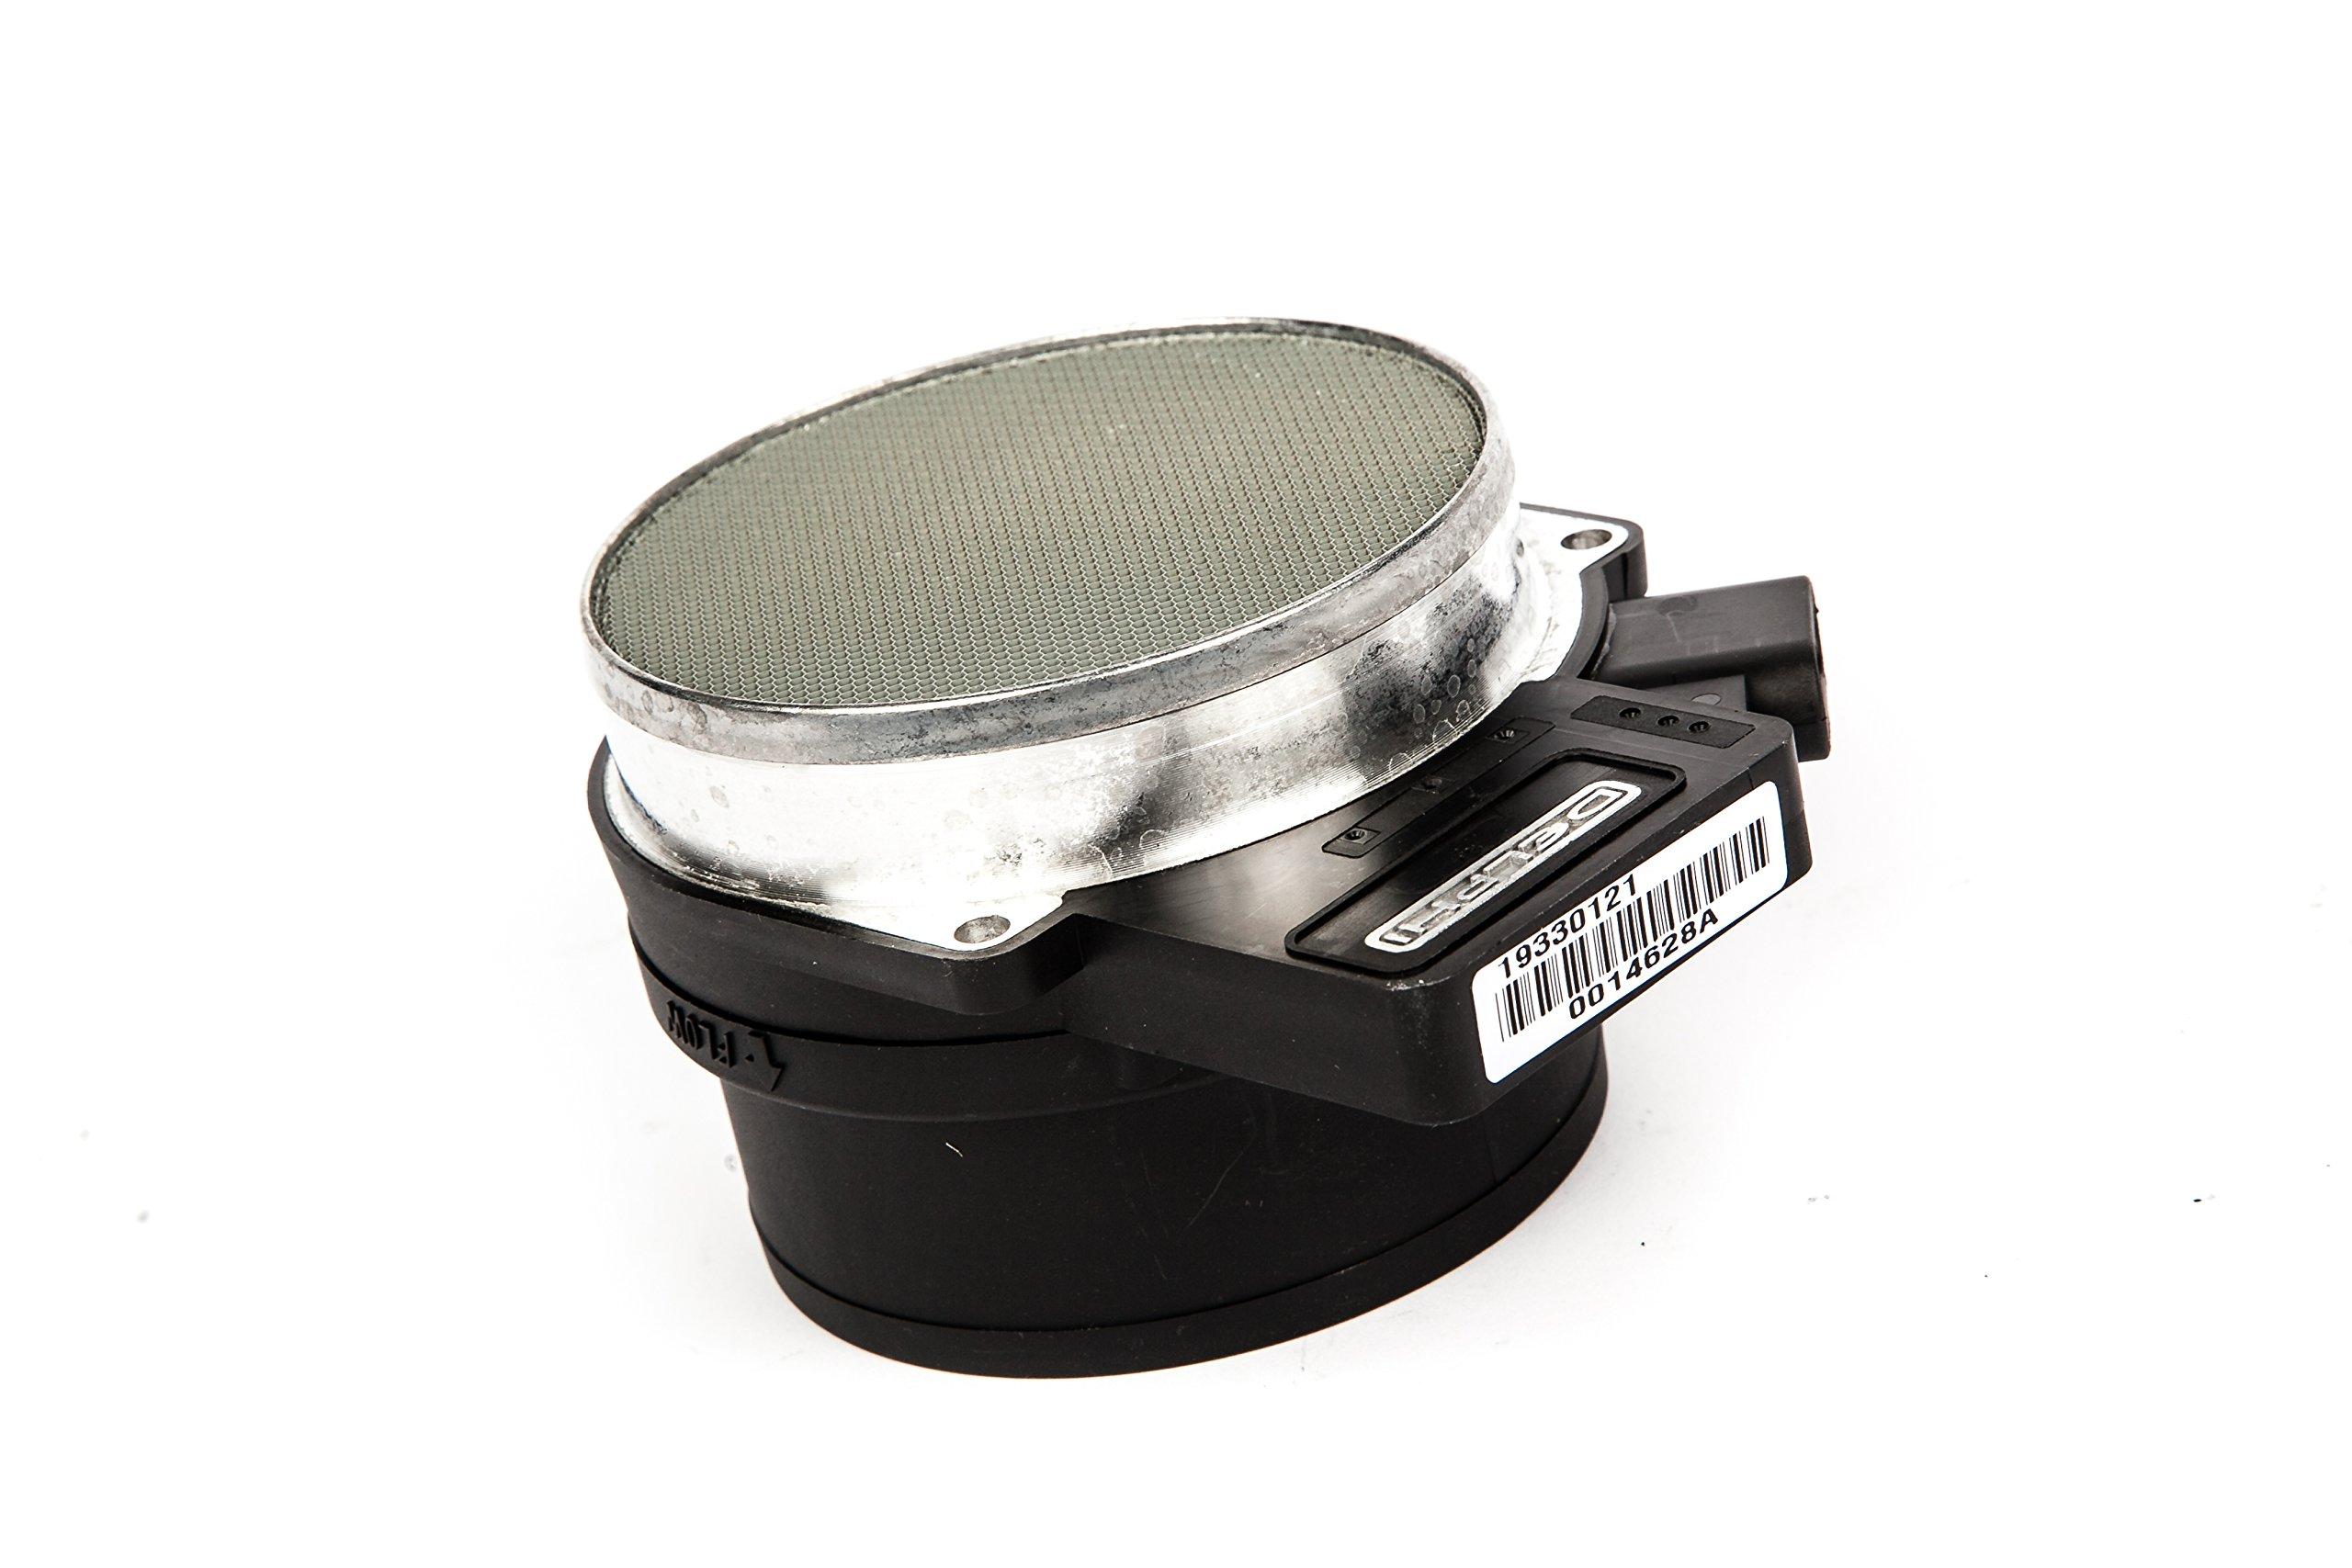 ACDelco 19330121 GM Original Equipment Mass Air Flow Sensor with Intake Air Temperature Sensor by ACDelco